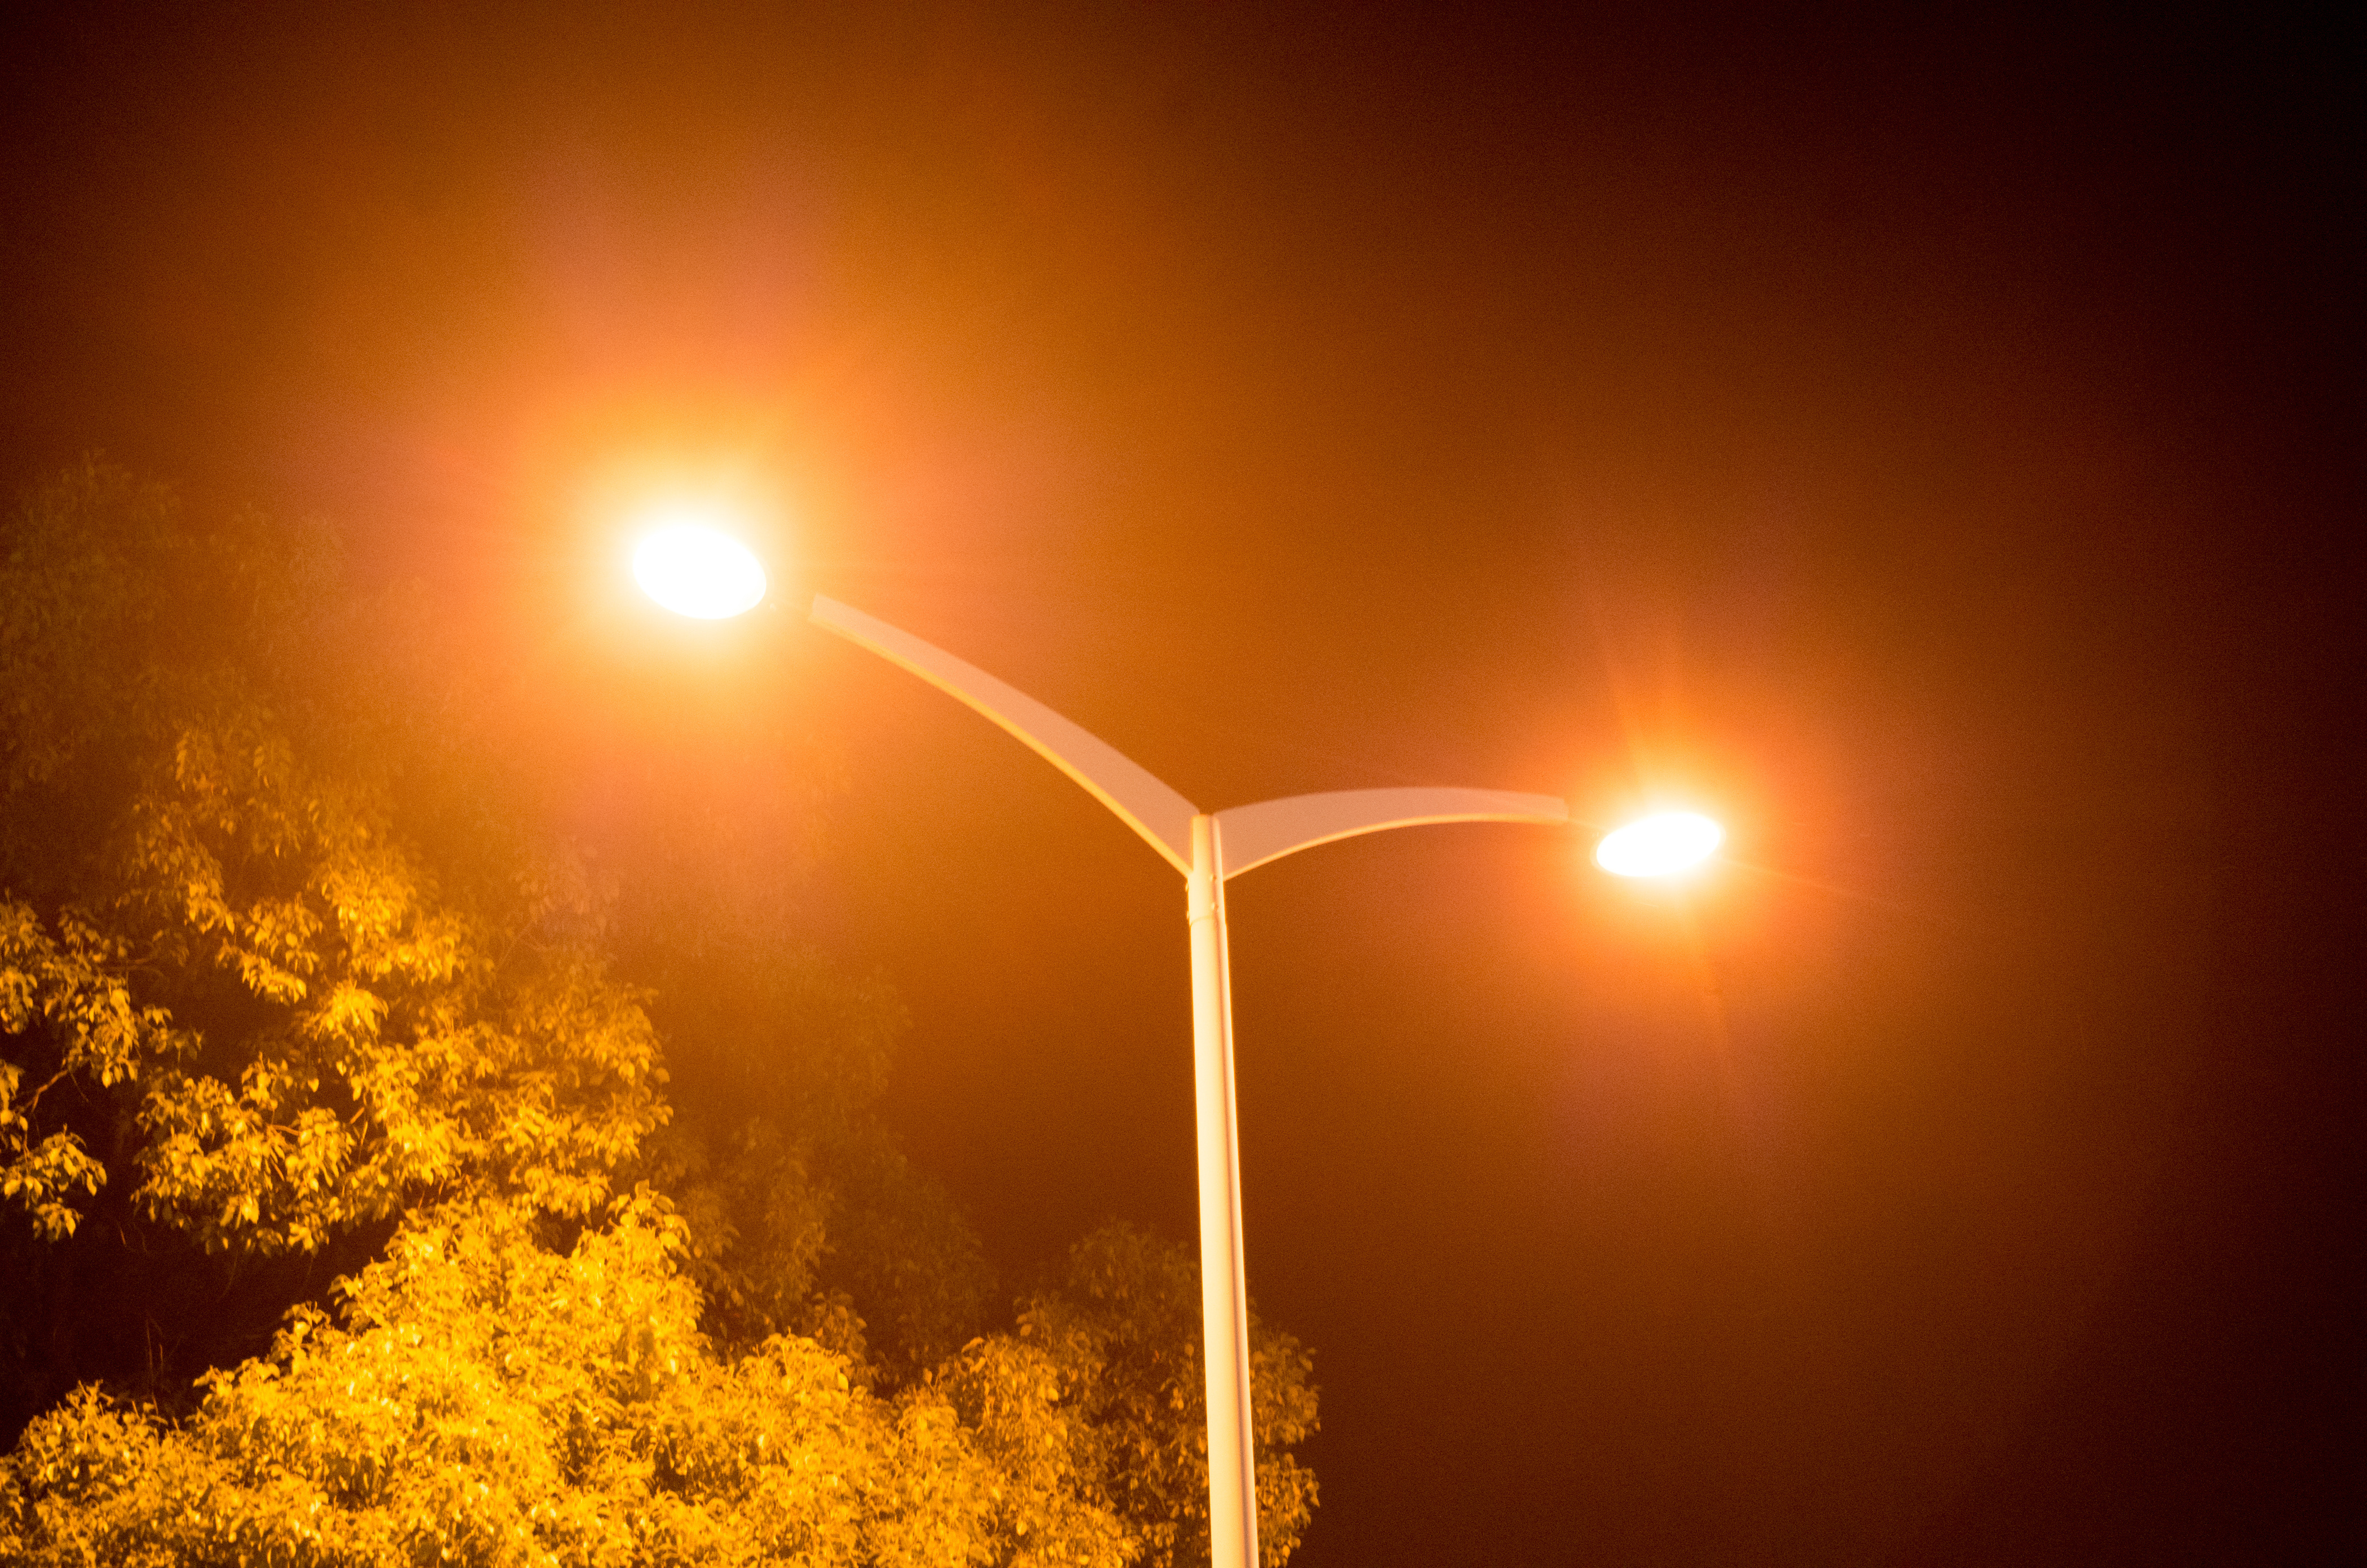 Lovepik_com-500426590-a-warm-yellow-street-lamp-at-night